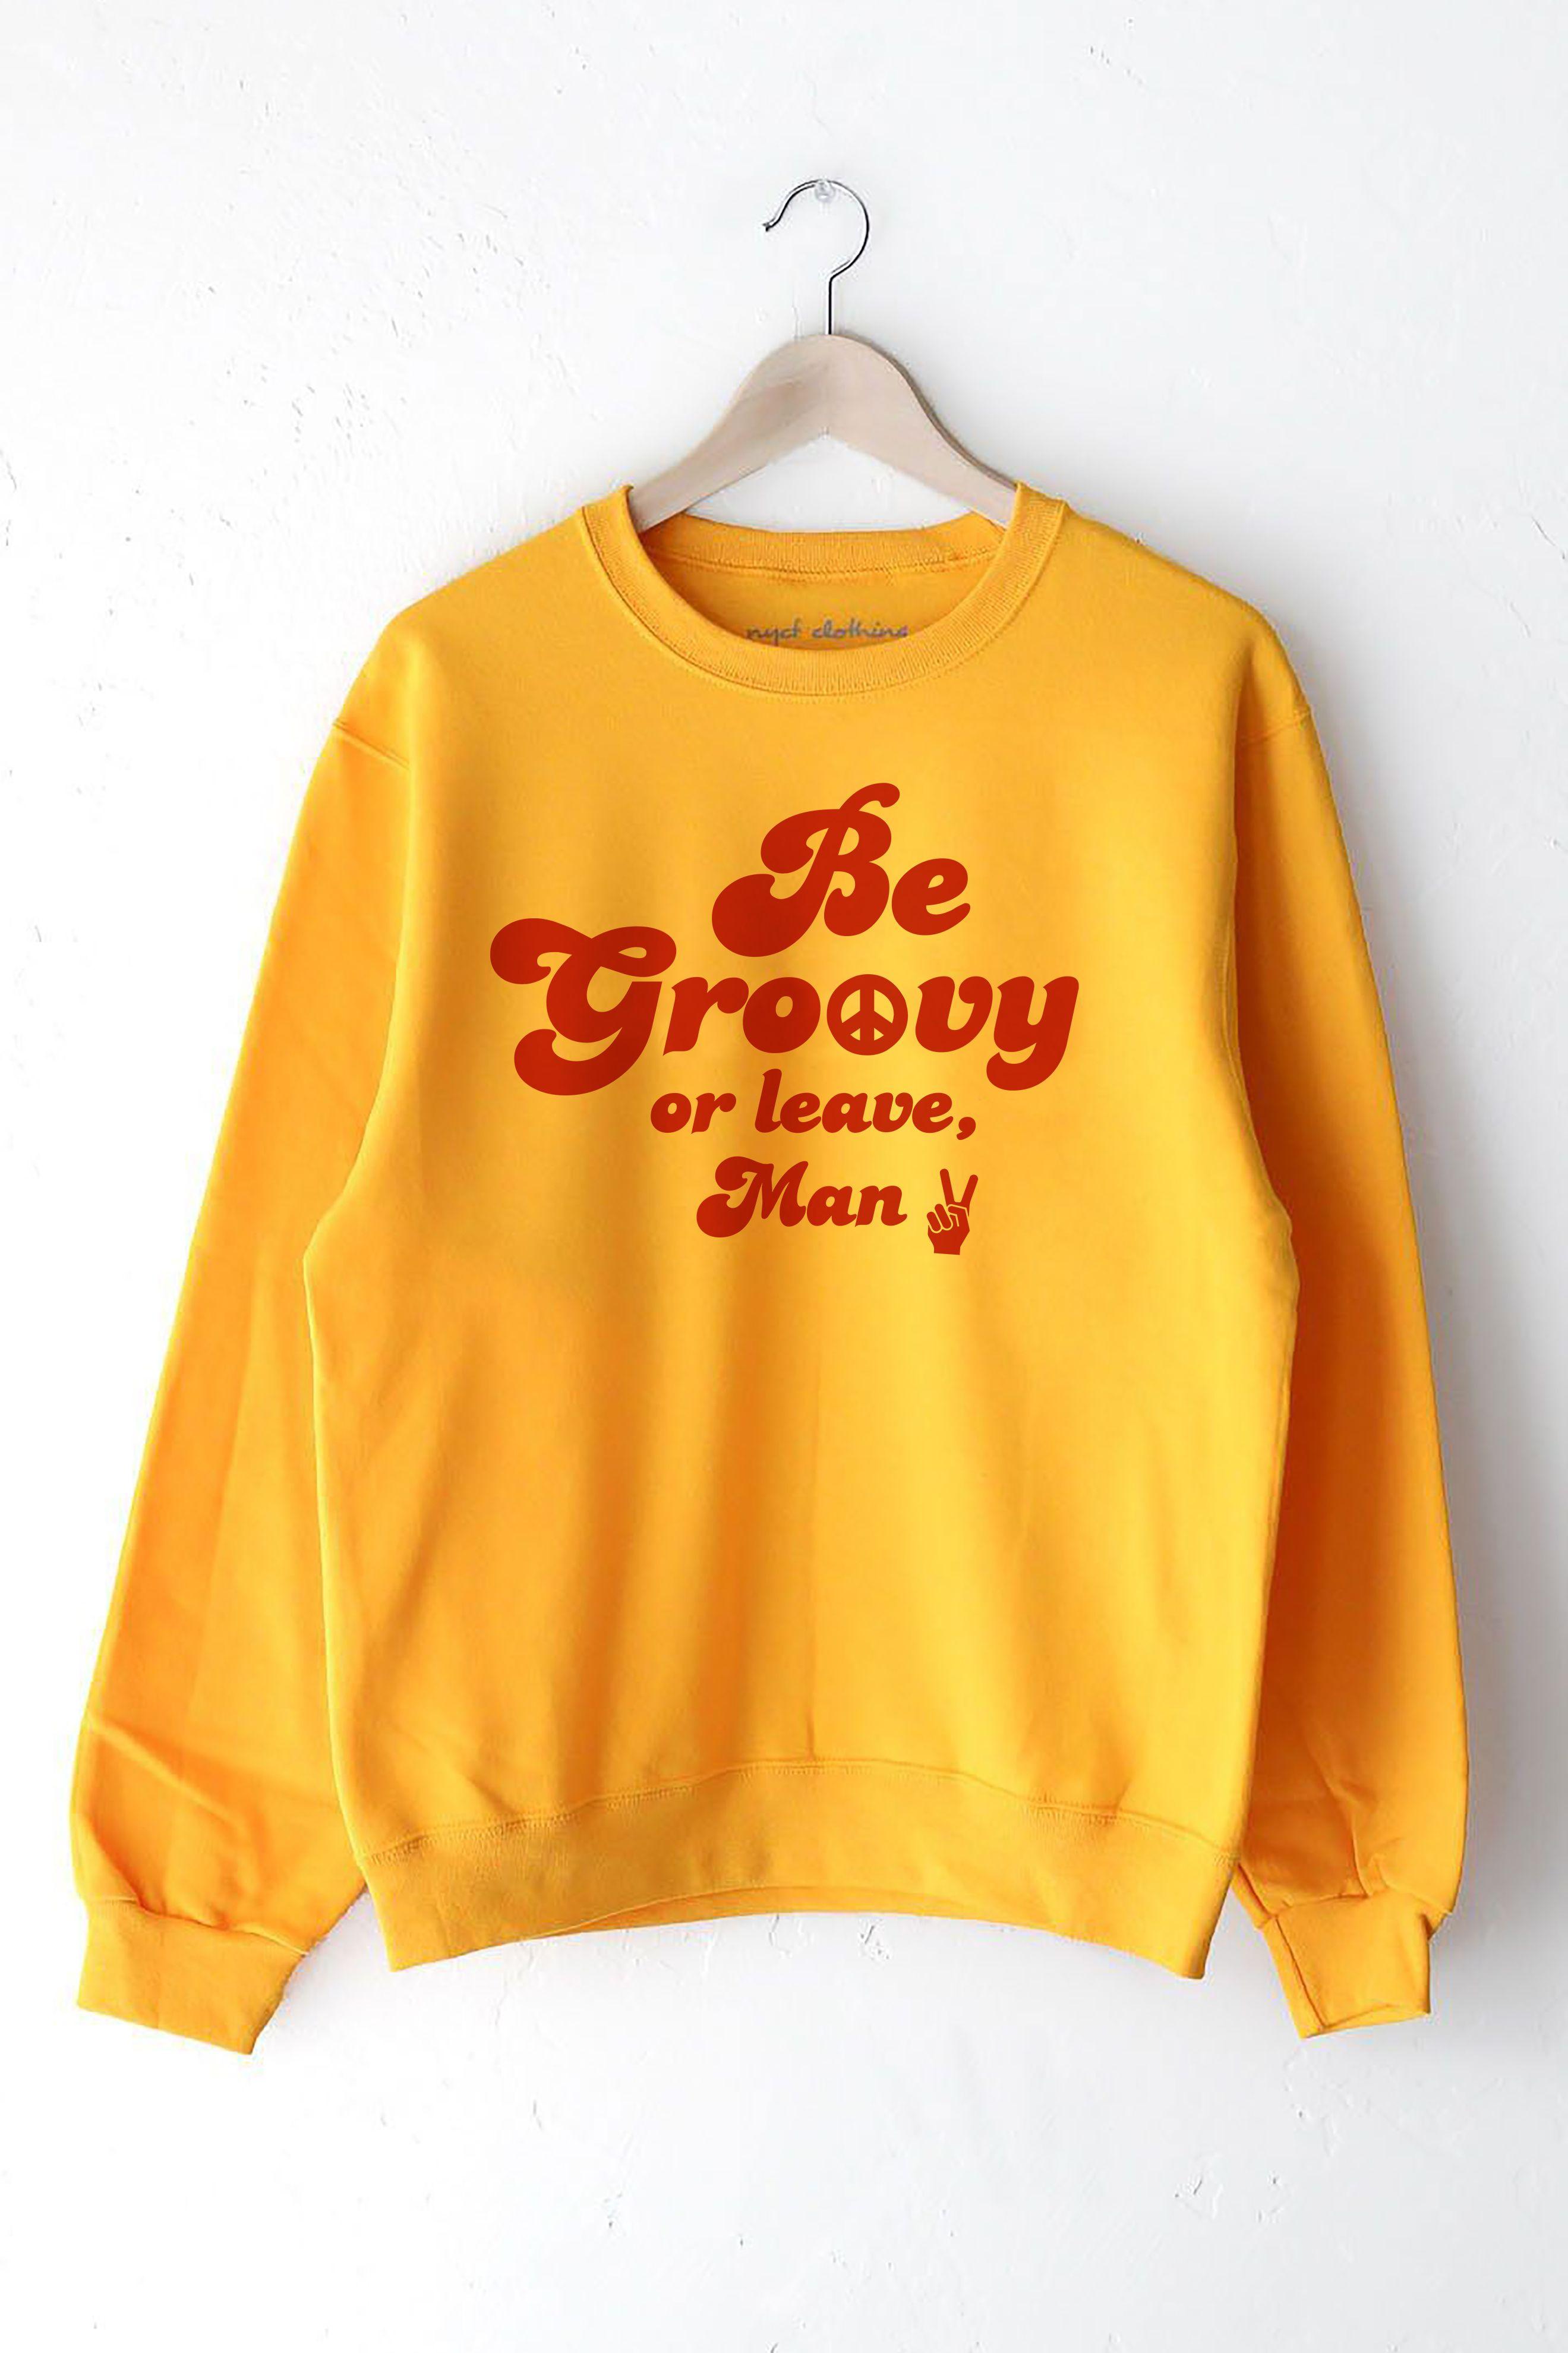 Unisex Groovy Decorations Sweatshirts Crewneck